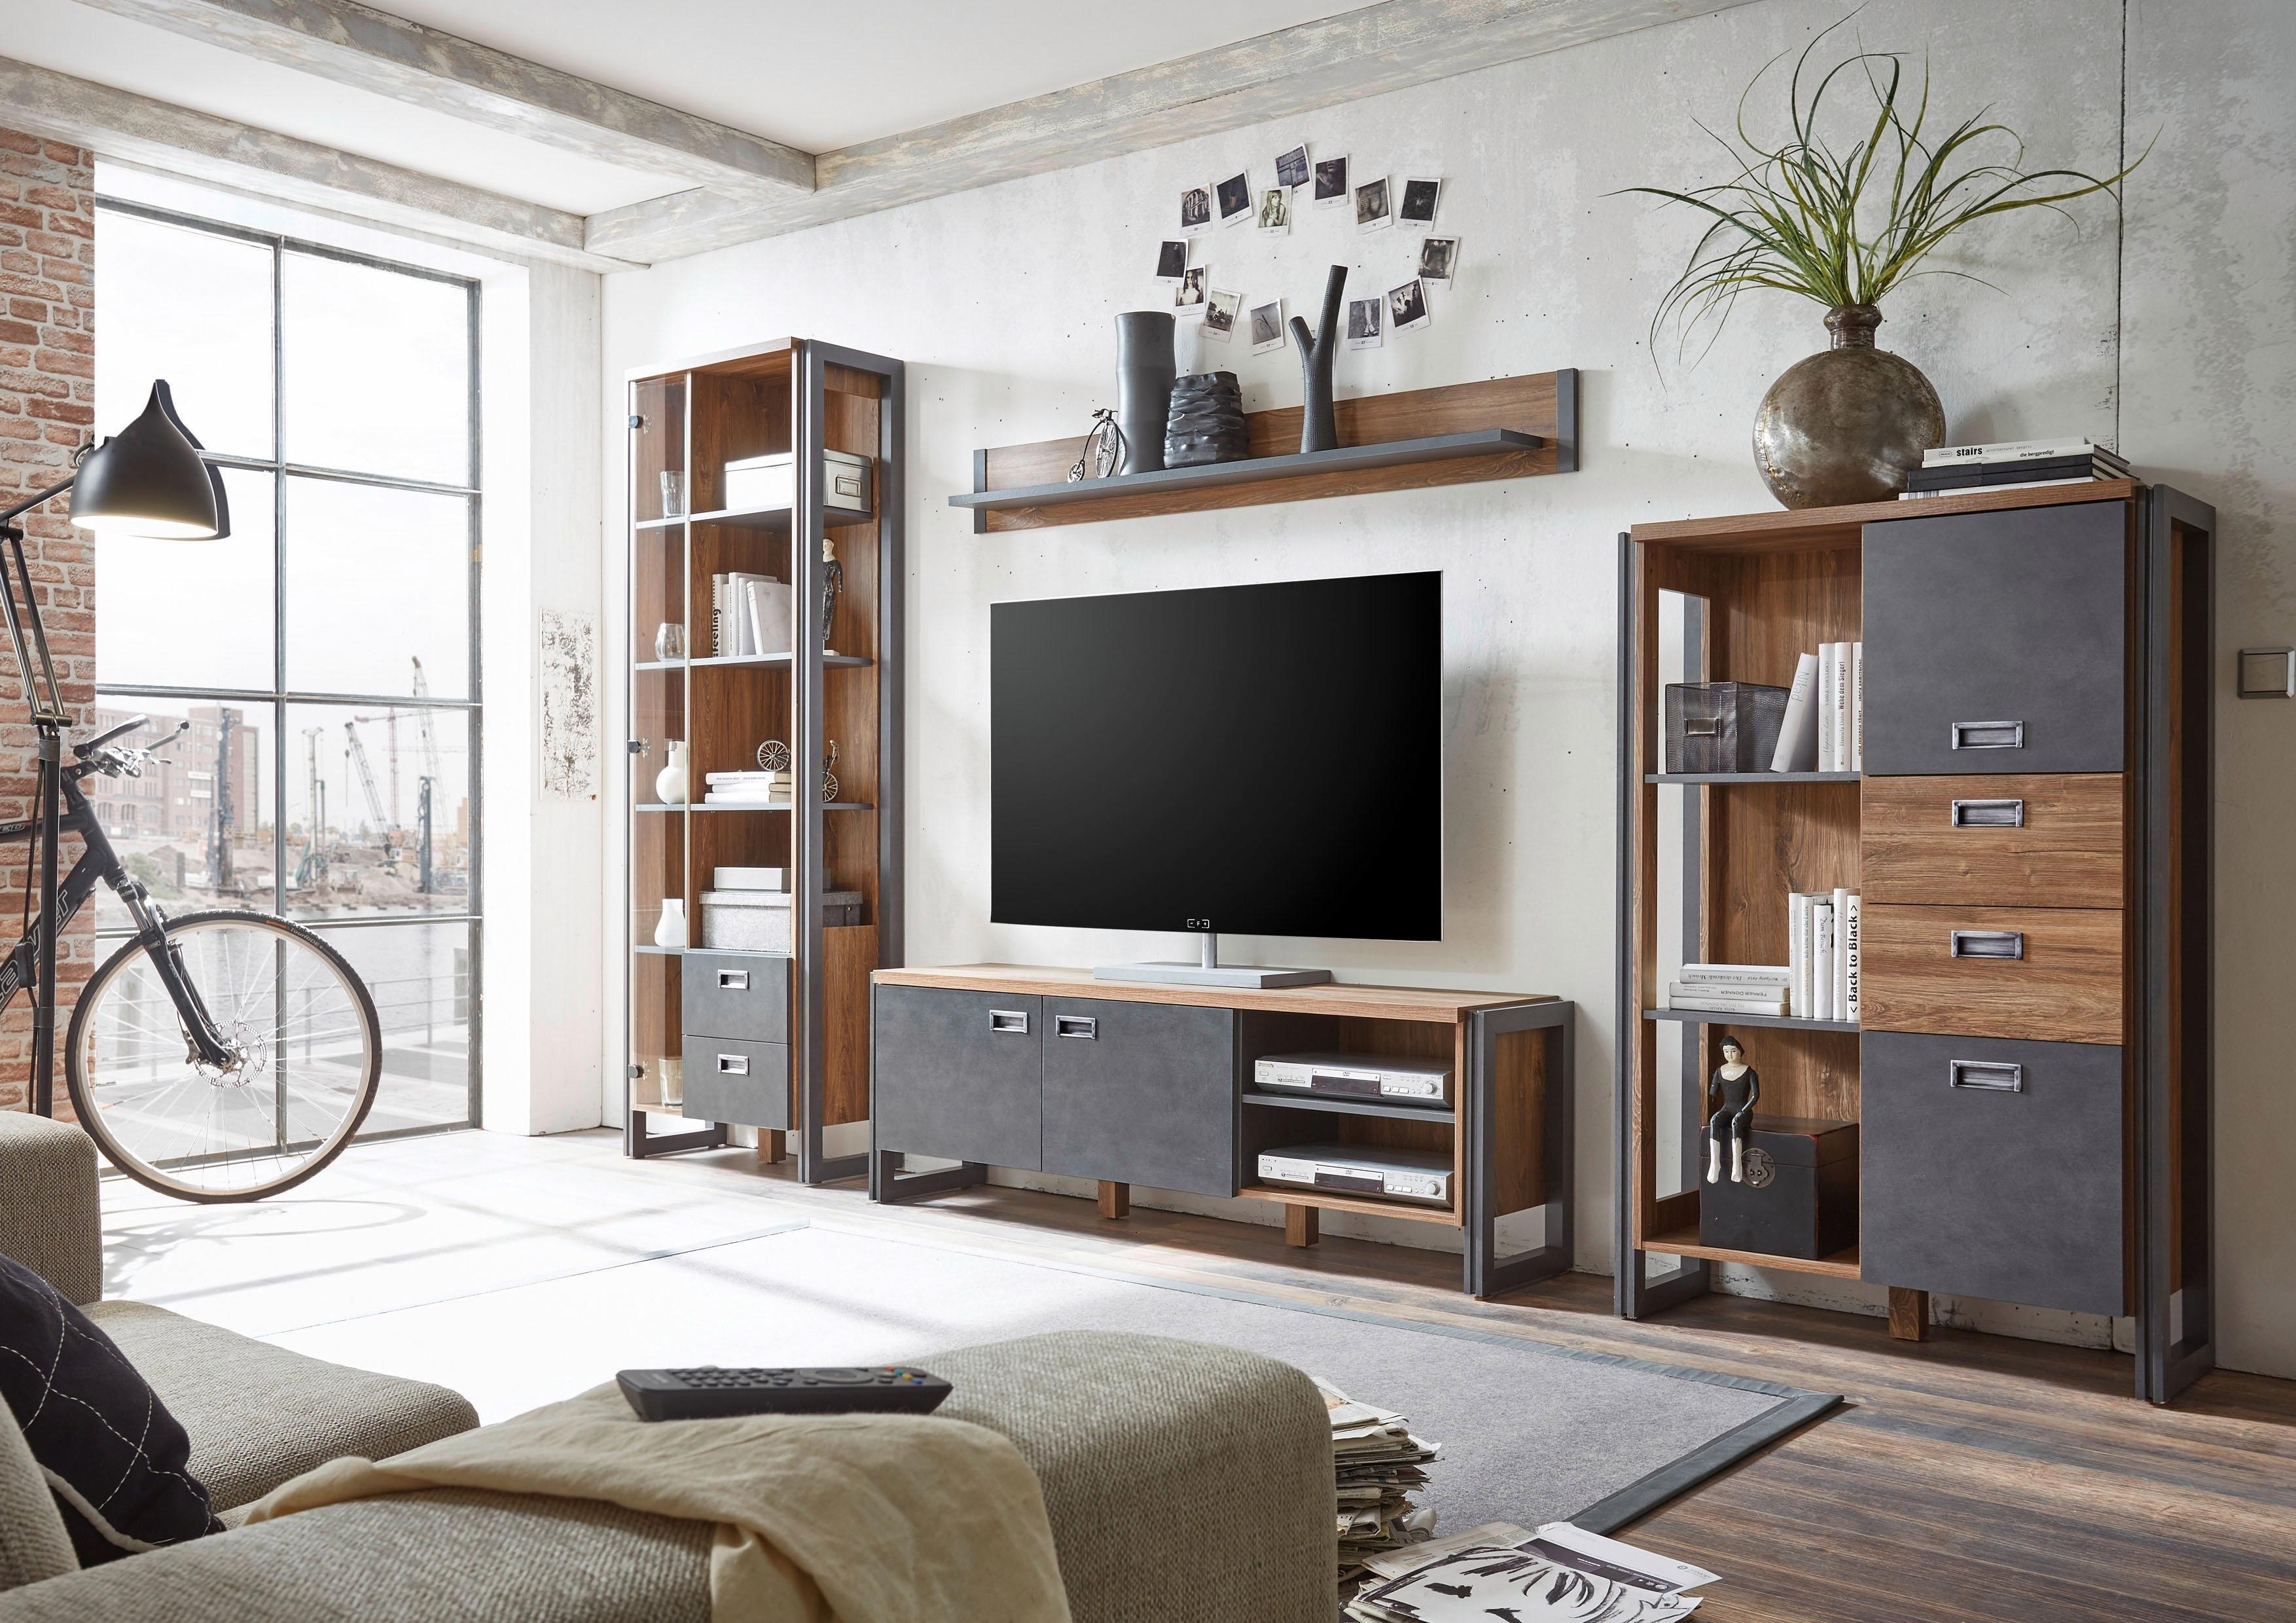 Trendy Tv Kast.Home Affaire 4 Dlg Wandmeubel Detroit Set 4 In Trendy